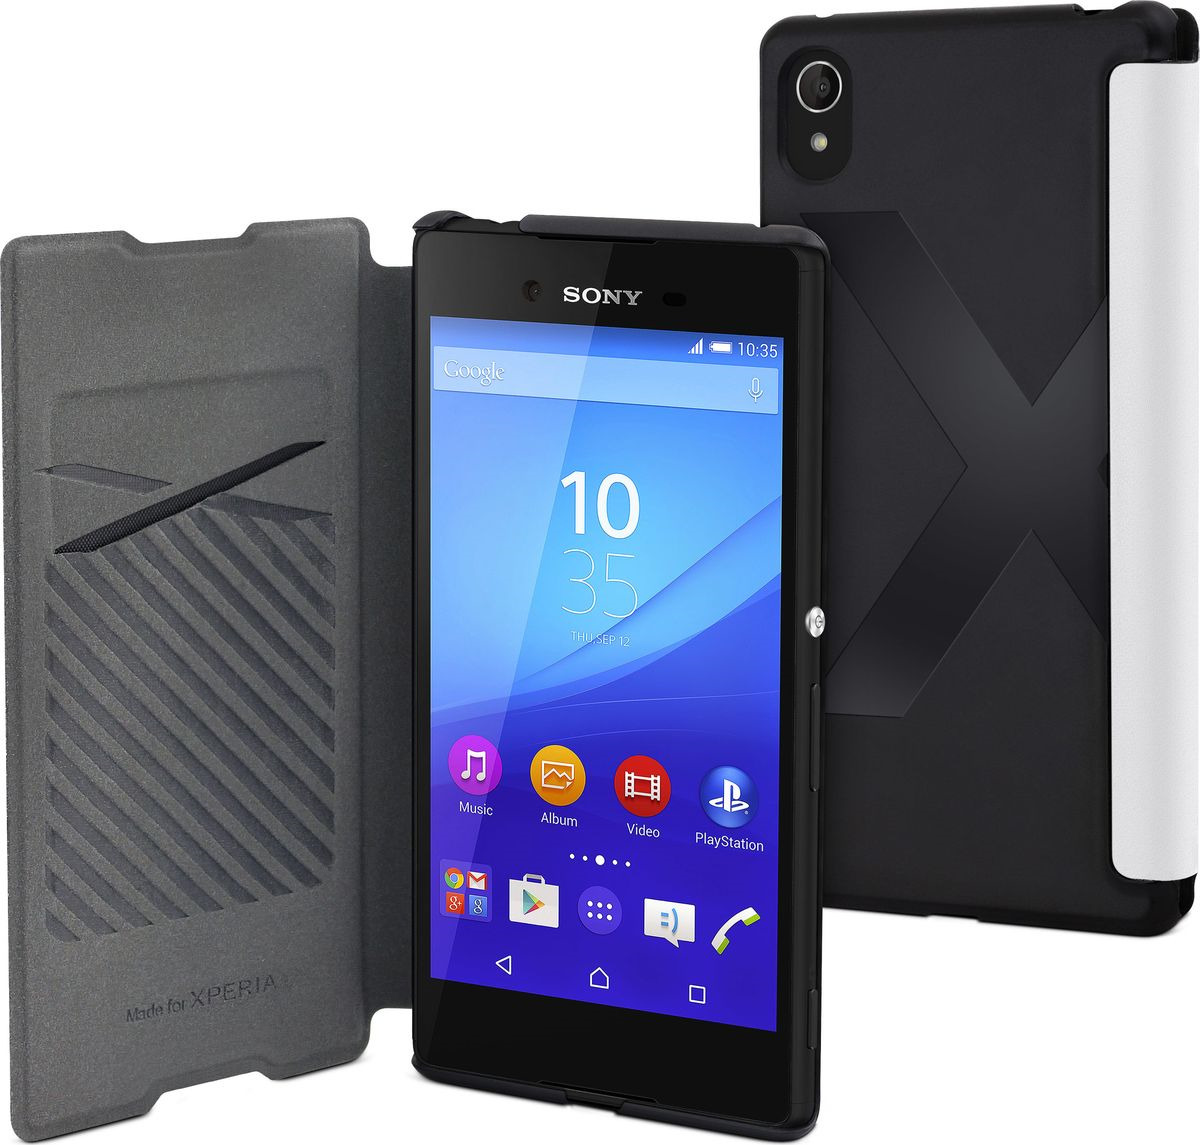 Чехол для сотового телефона Muvit MFX Easy Folio Case для Sony Xperia Z3+, SEEAF0032, белый чехол для sony f8331 f8332 xperia xz skinbox lux case черный